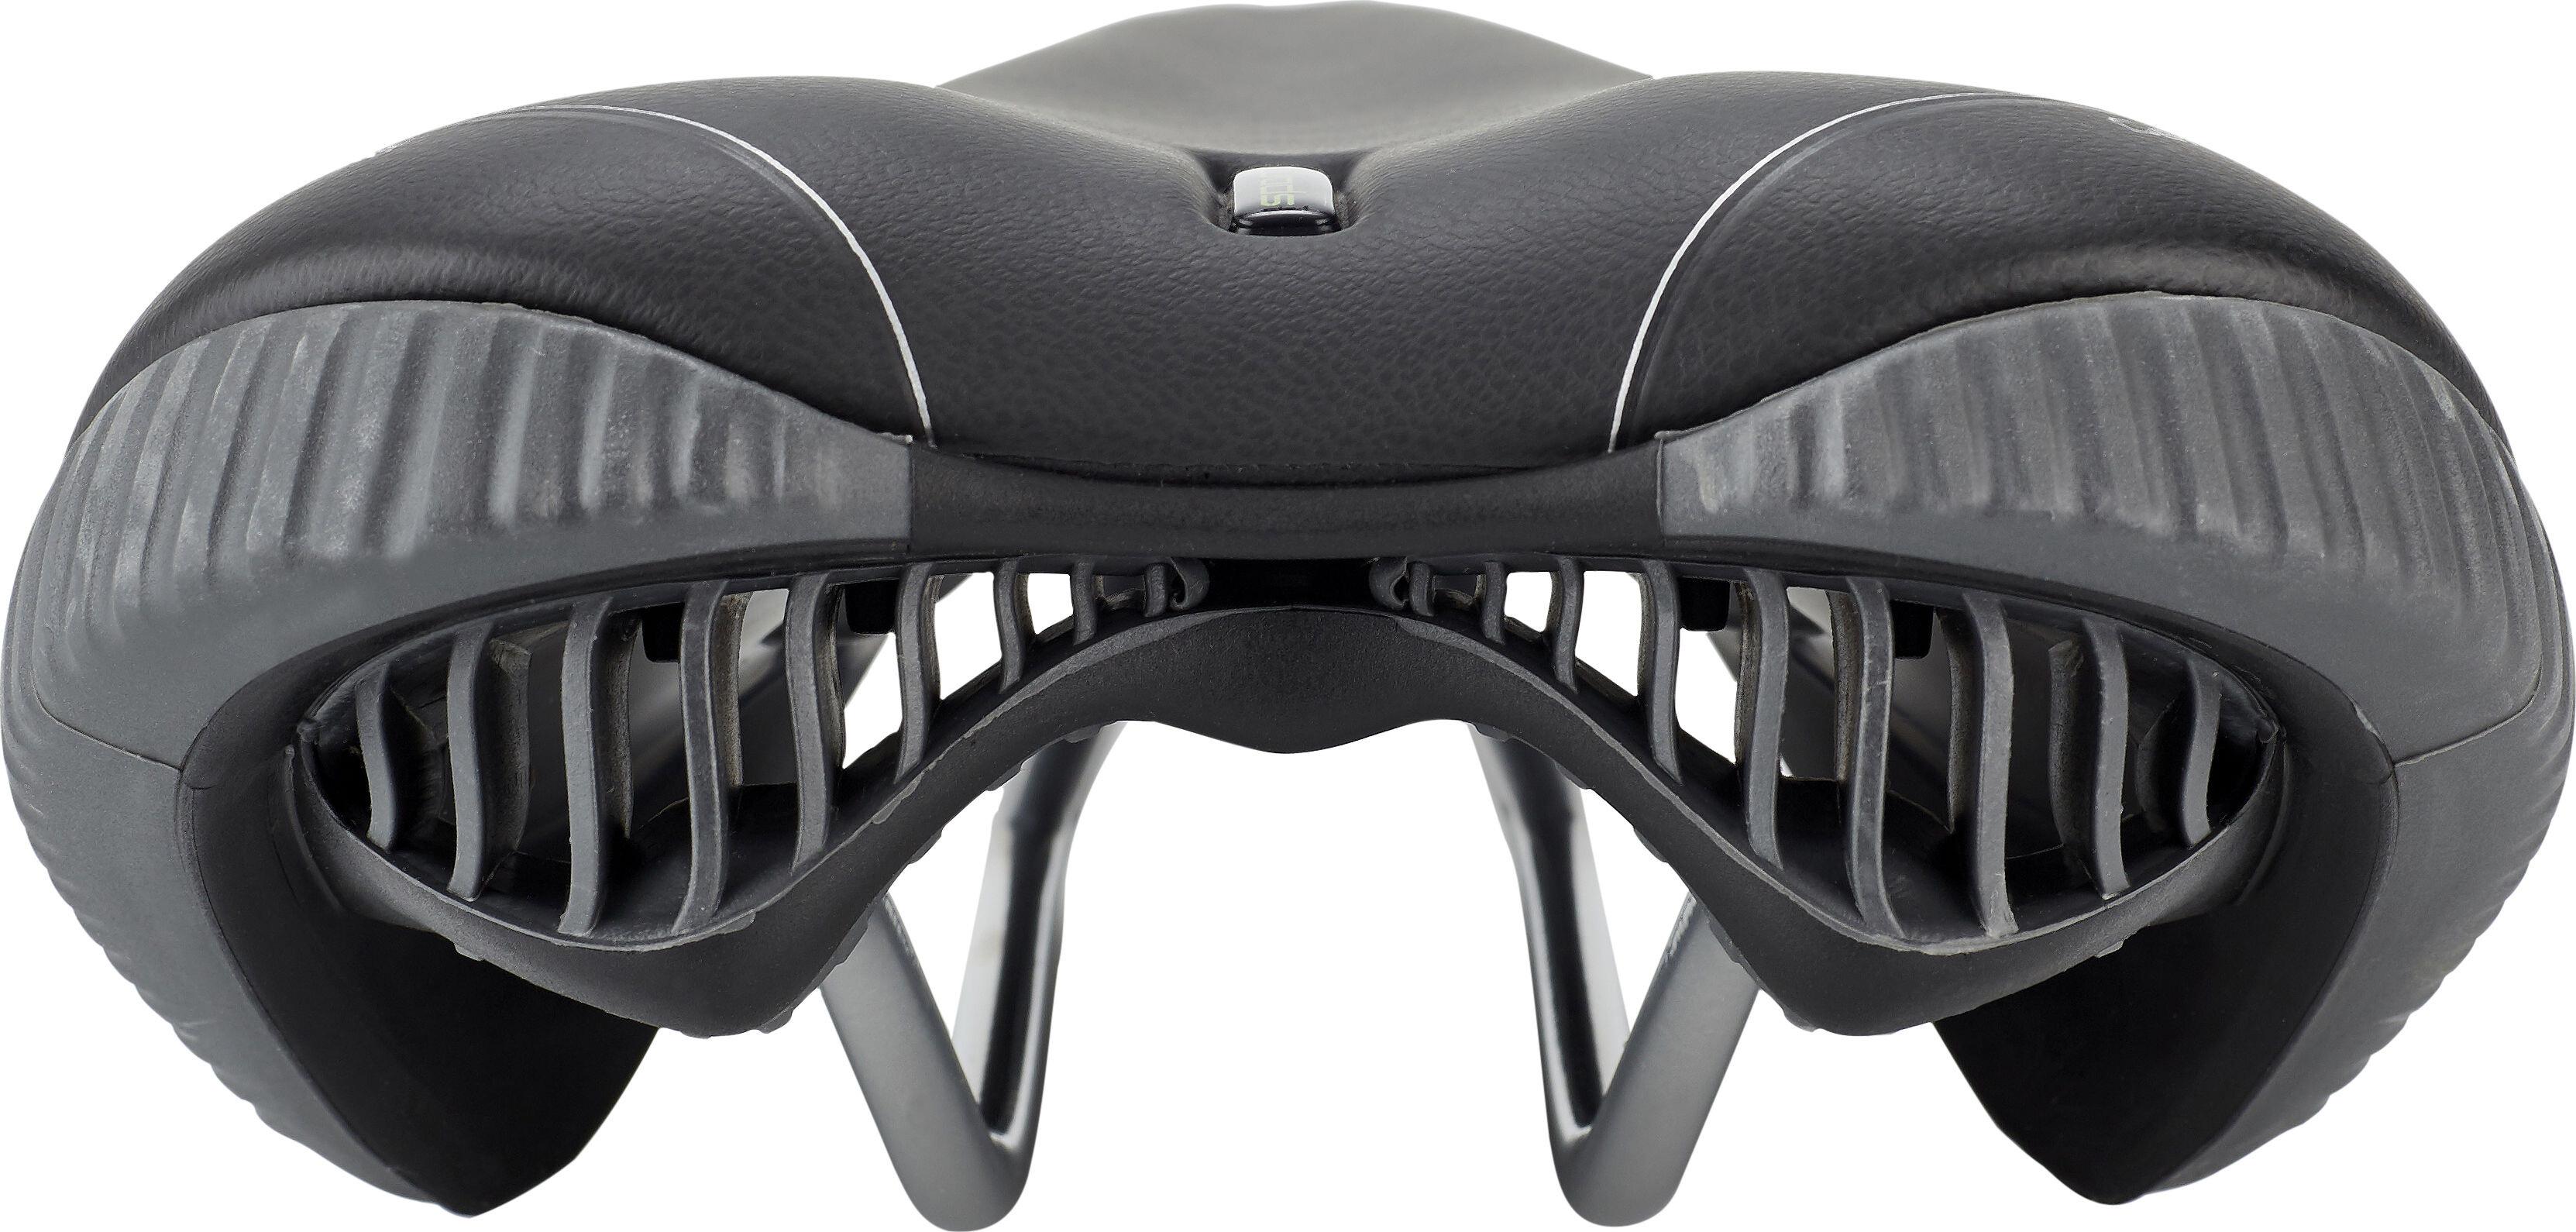 sportourer garda gel fahrradsattel herren schwarz online. Black Bedroom Furniture Sets. Home Design Ideas